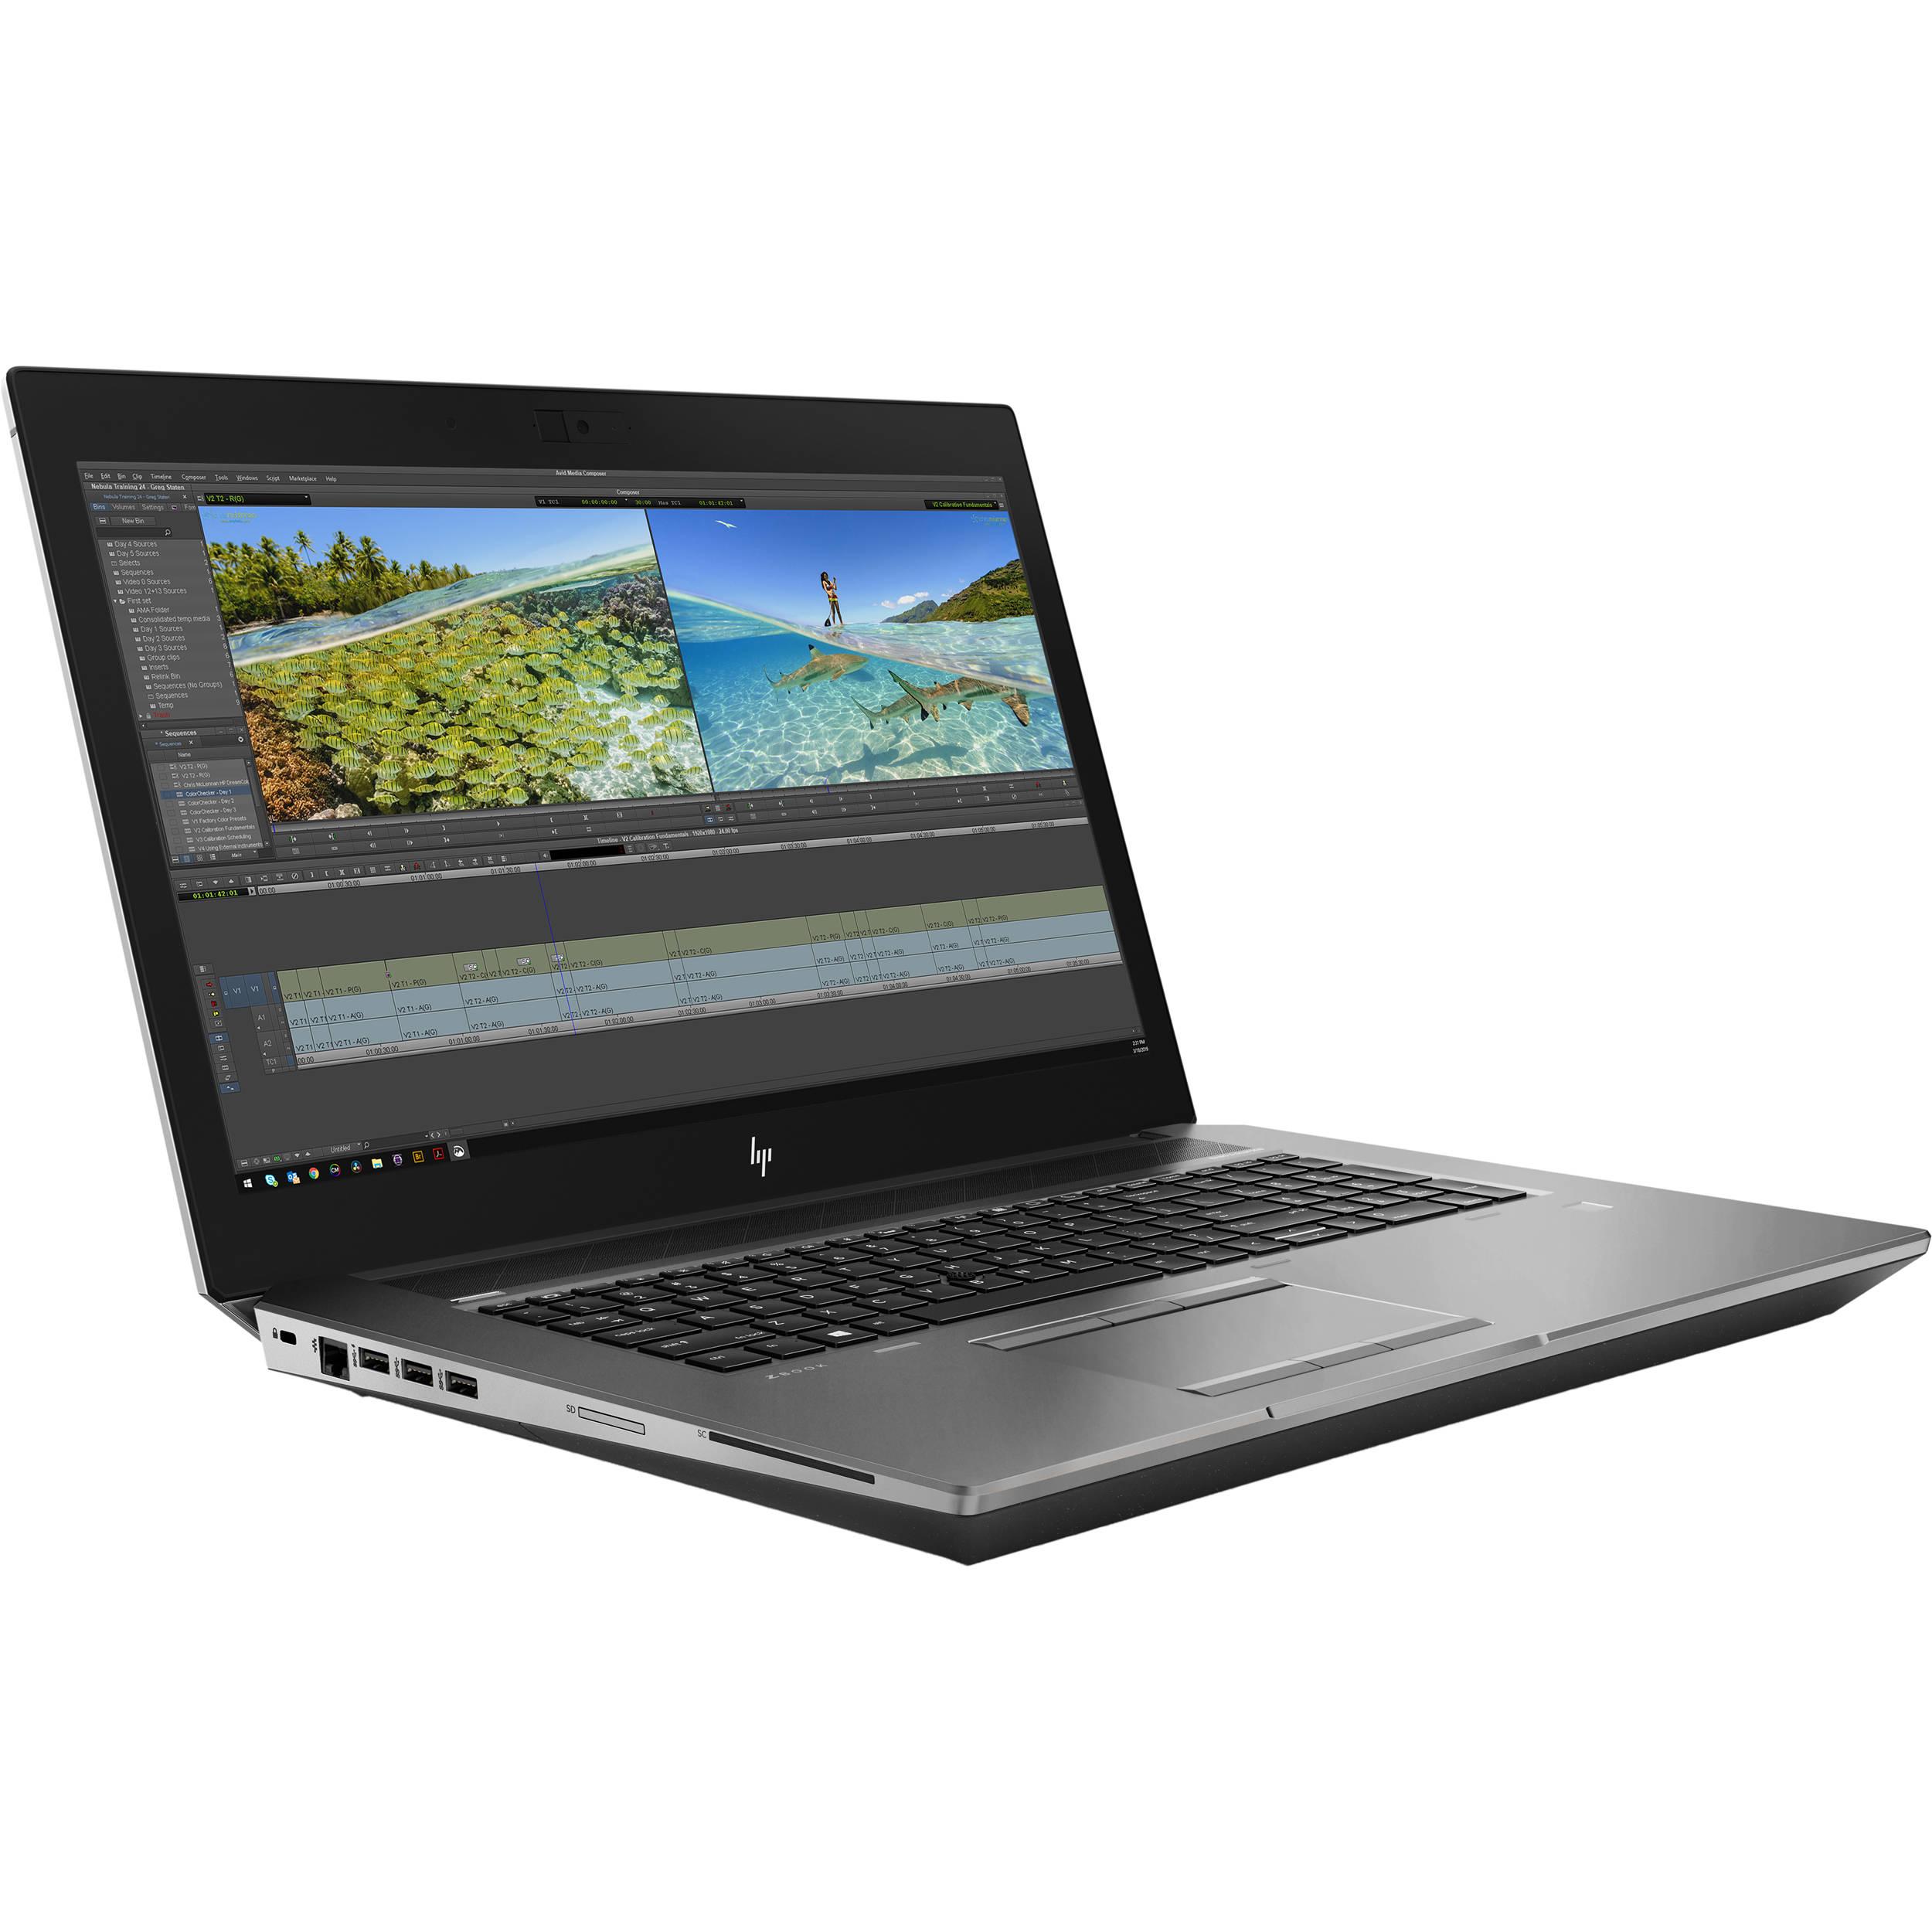 "مشخصات، قیمت و خرید لپ تاپ HP ZBook 17 G6 17.3""i9-9880H VPro RTX5000 16GB BestLaptop4u.com"